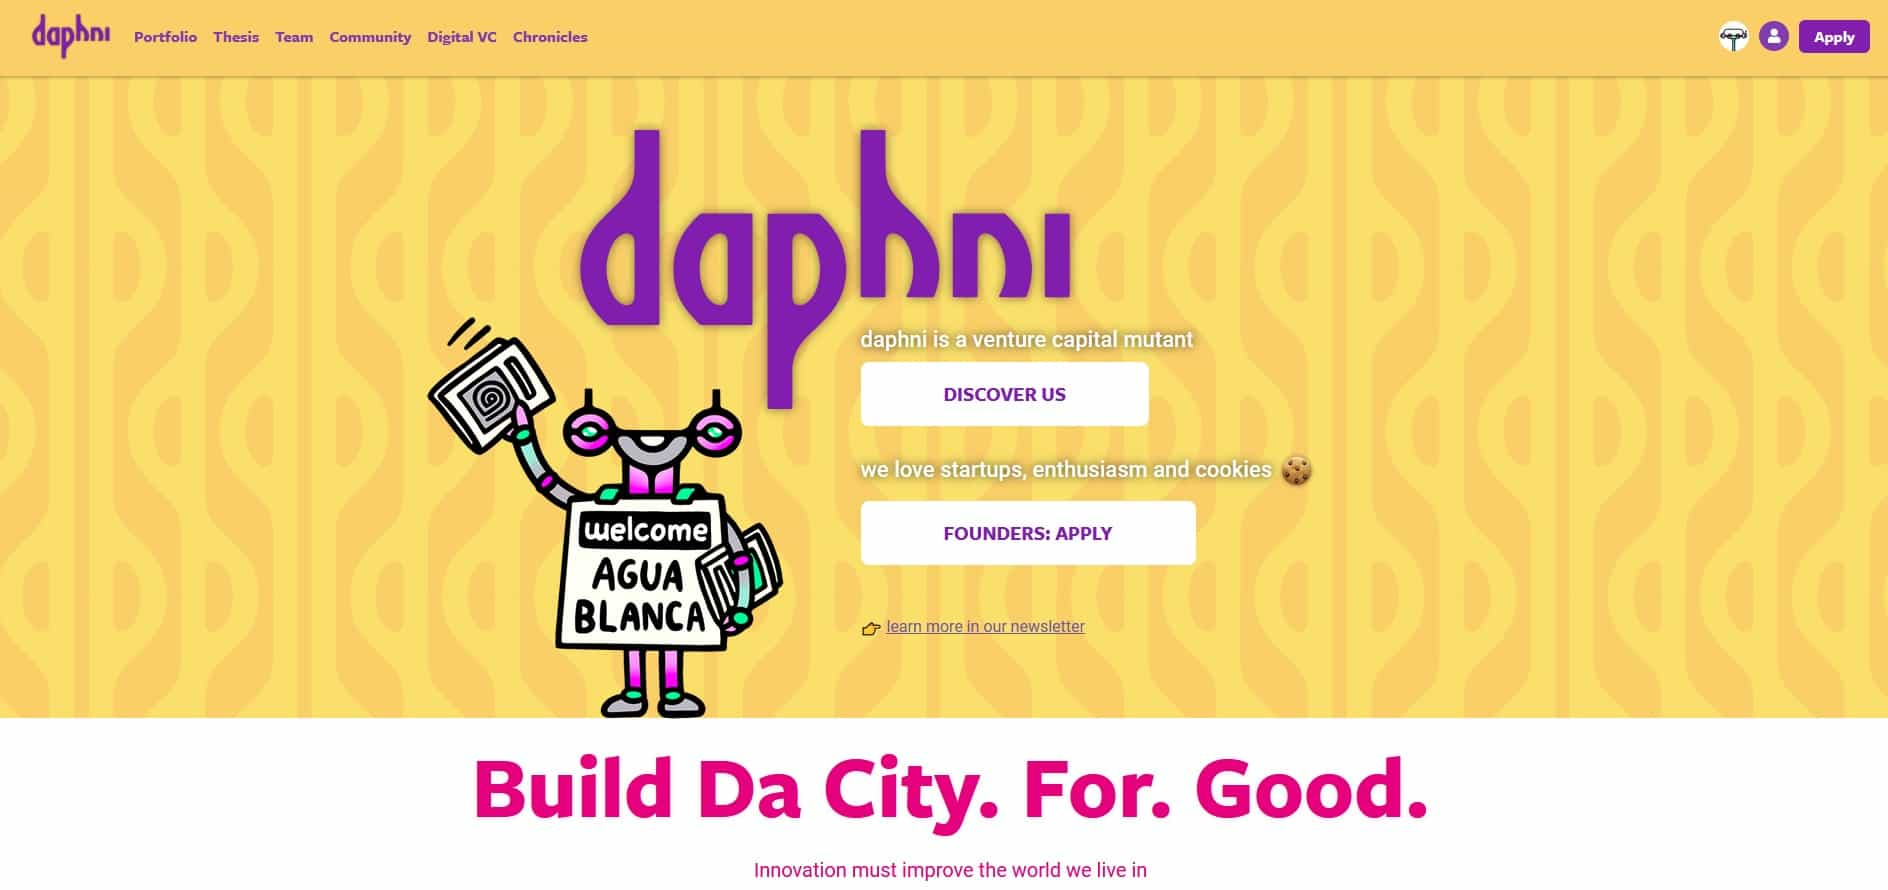 Daphni VC